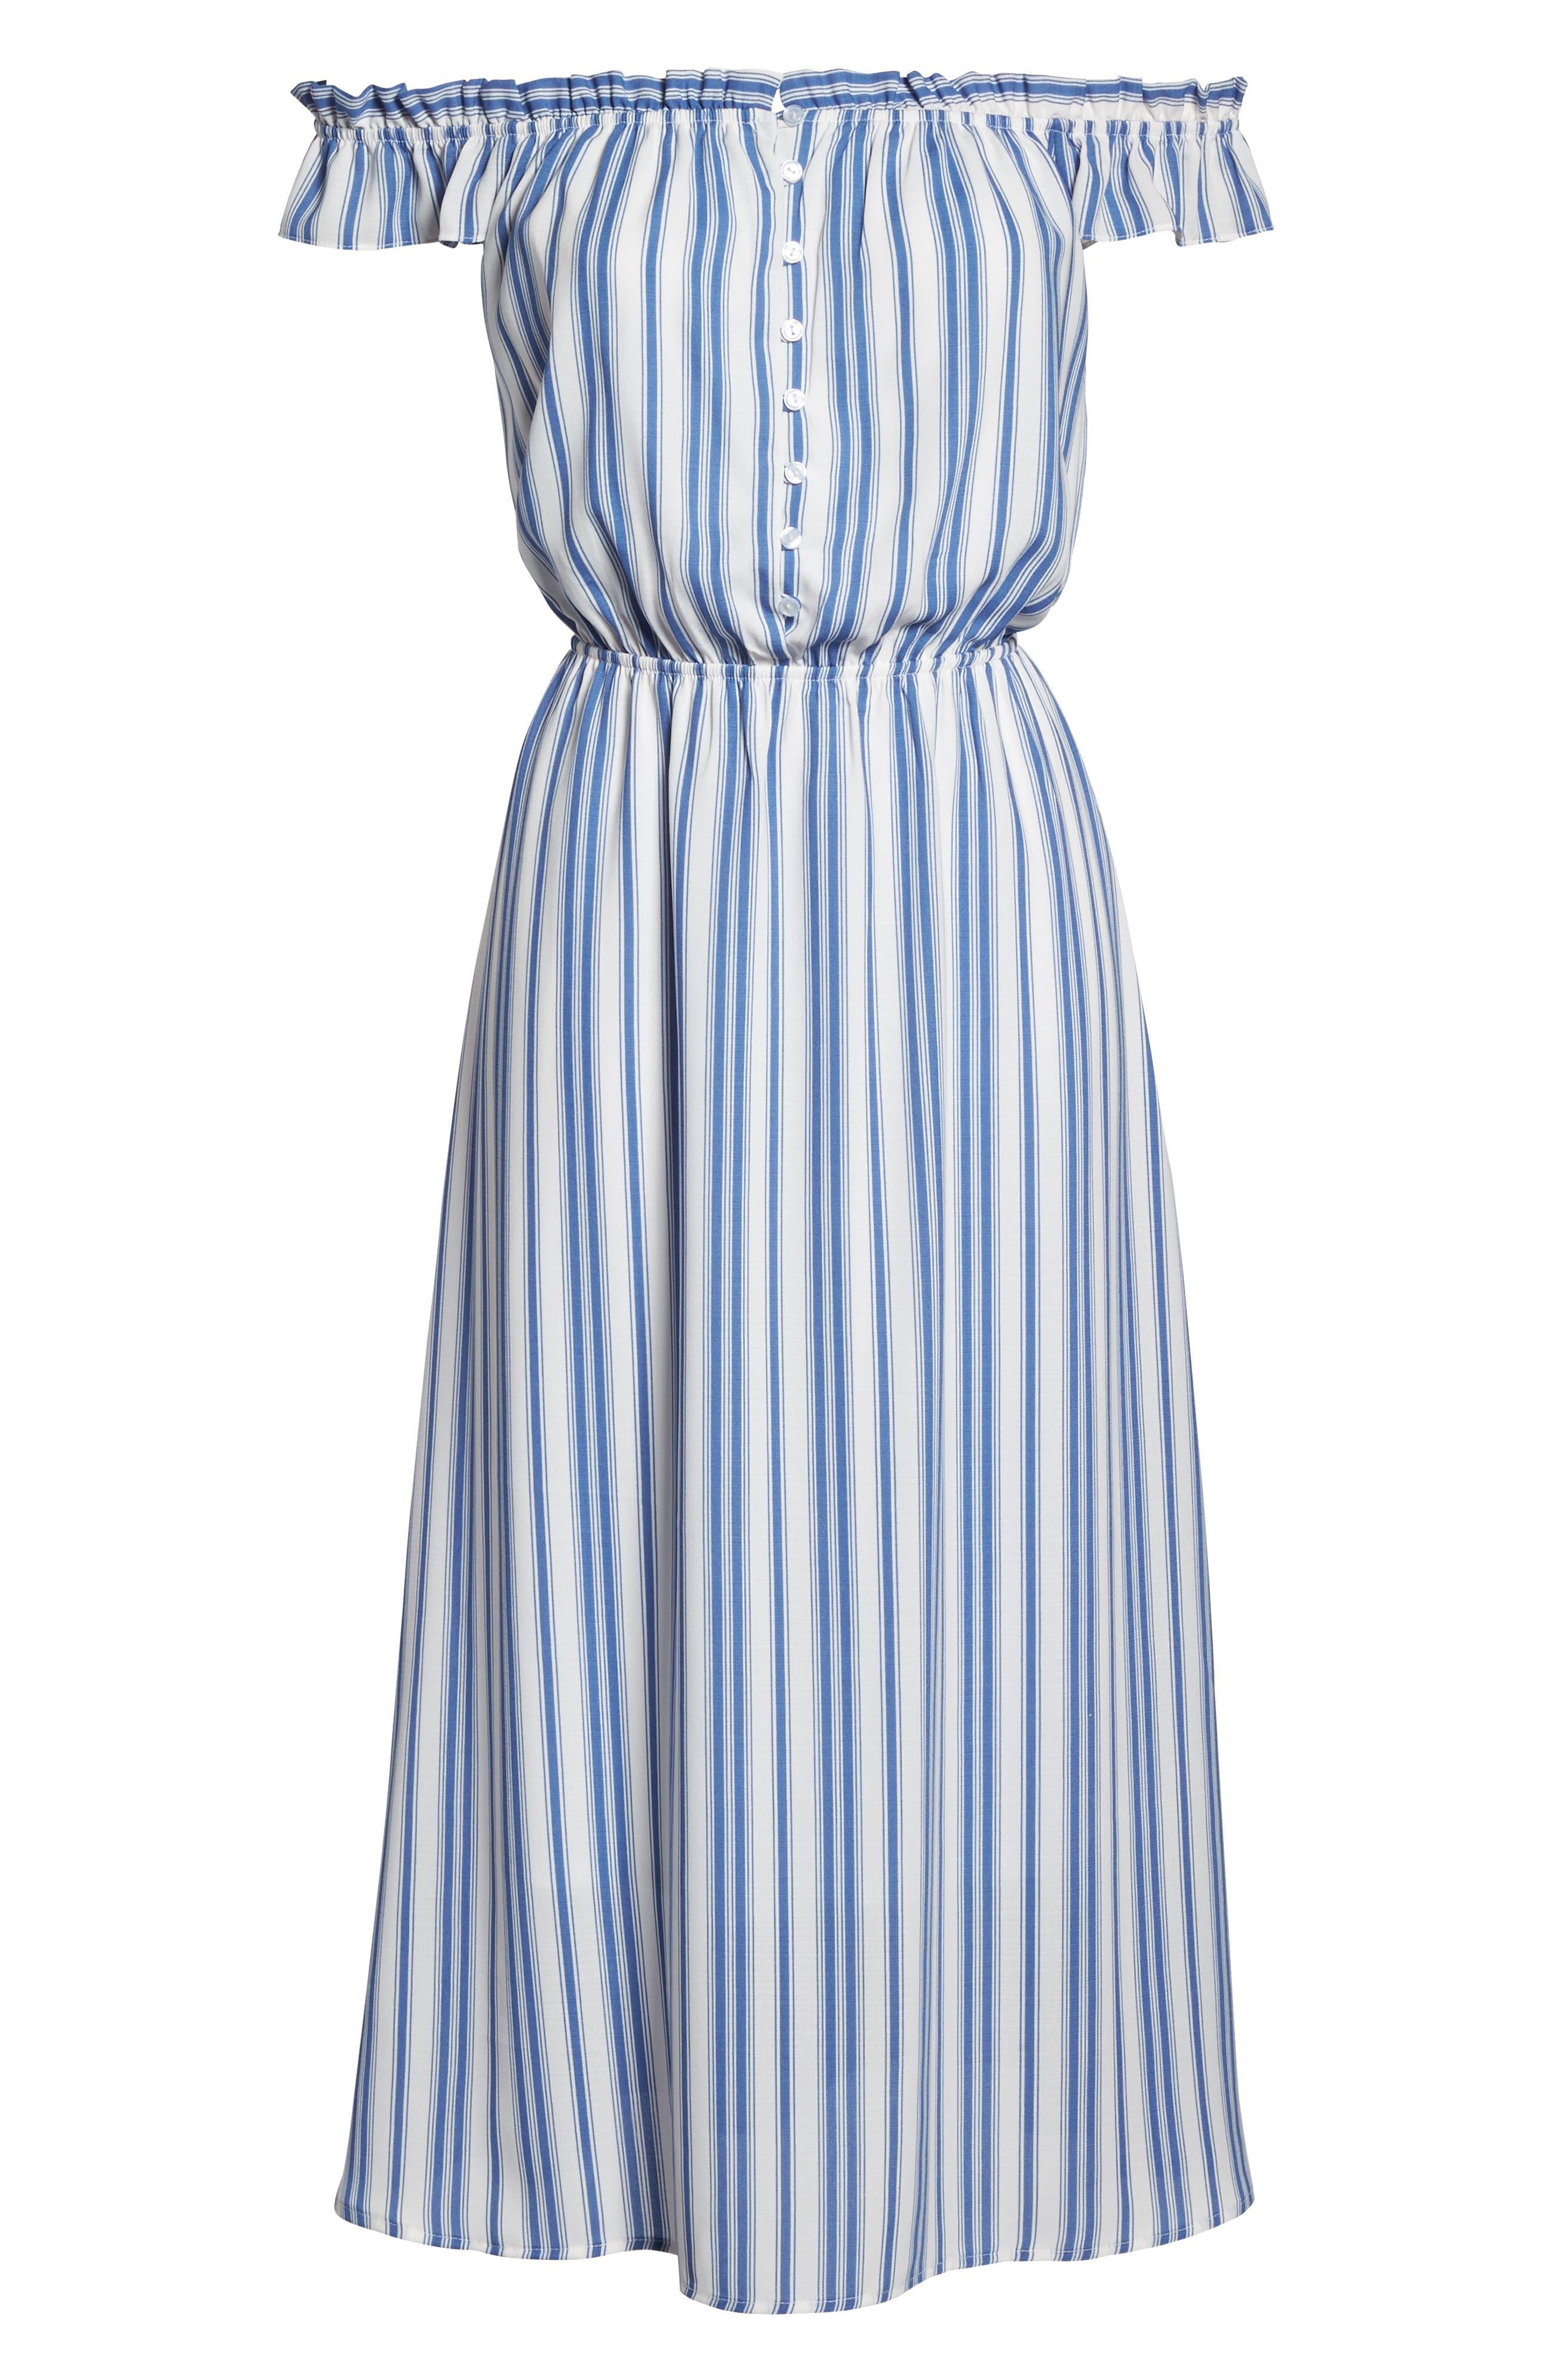 Prairie Off the Shoulder Dress,                             Alternate thumbnail 6, color,                             452